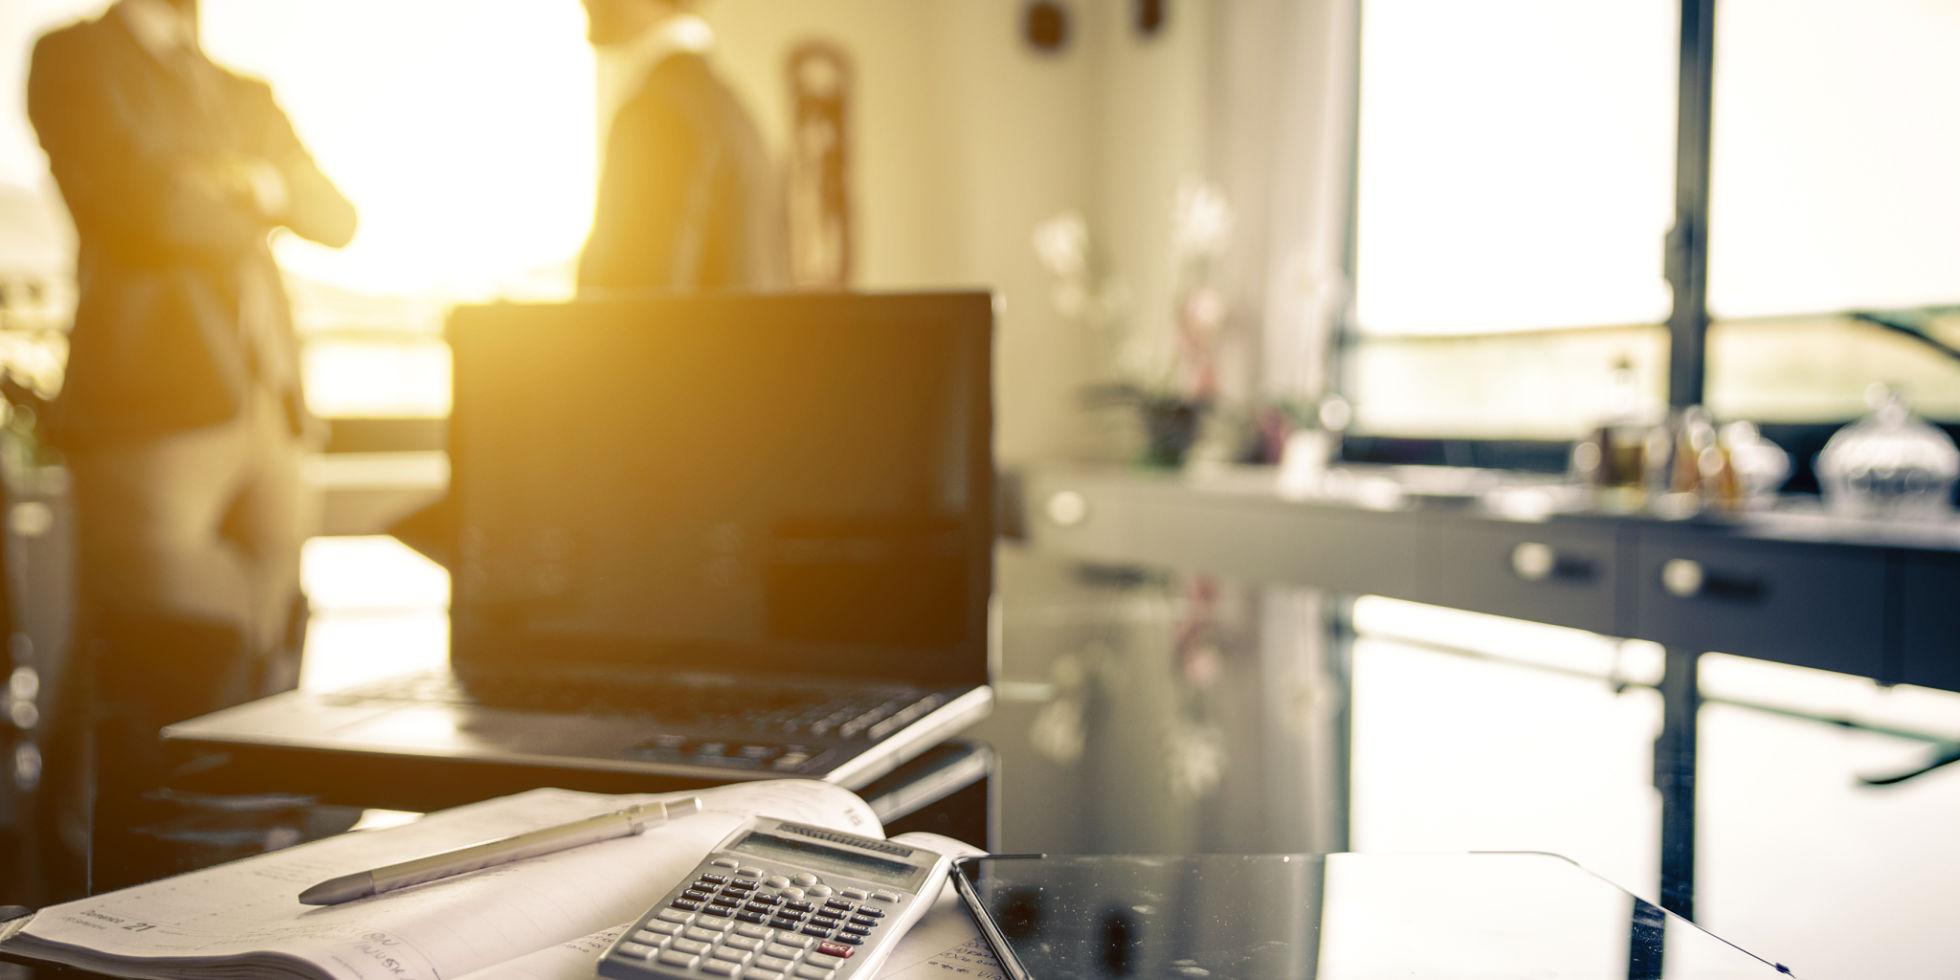 Office interior - employee communications